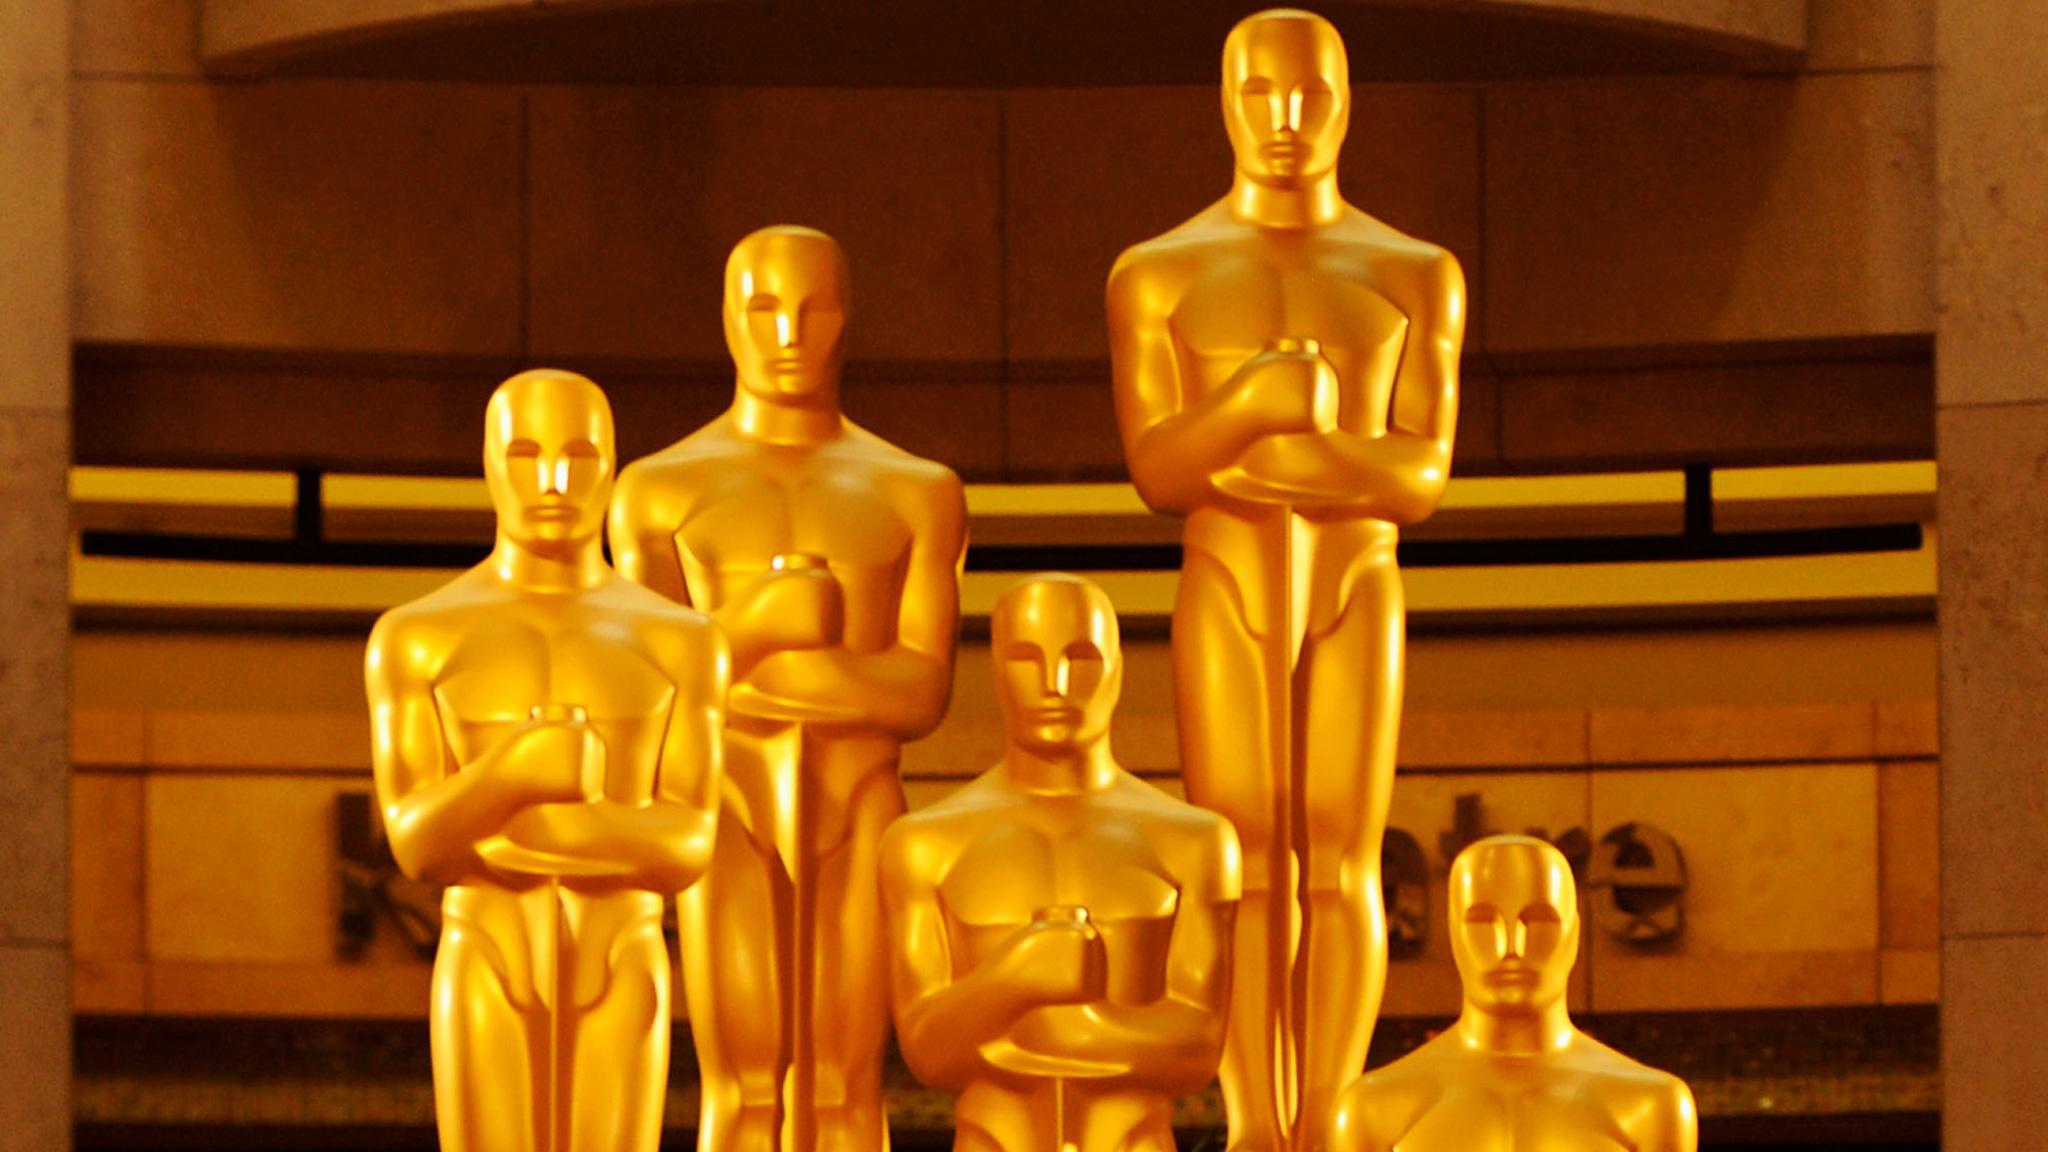 - The 2015 Oscars Red Carpet Live - ABCTechnical Director - Richard Ehrenberg